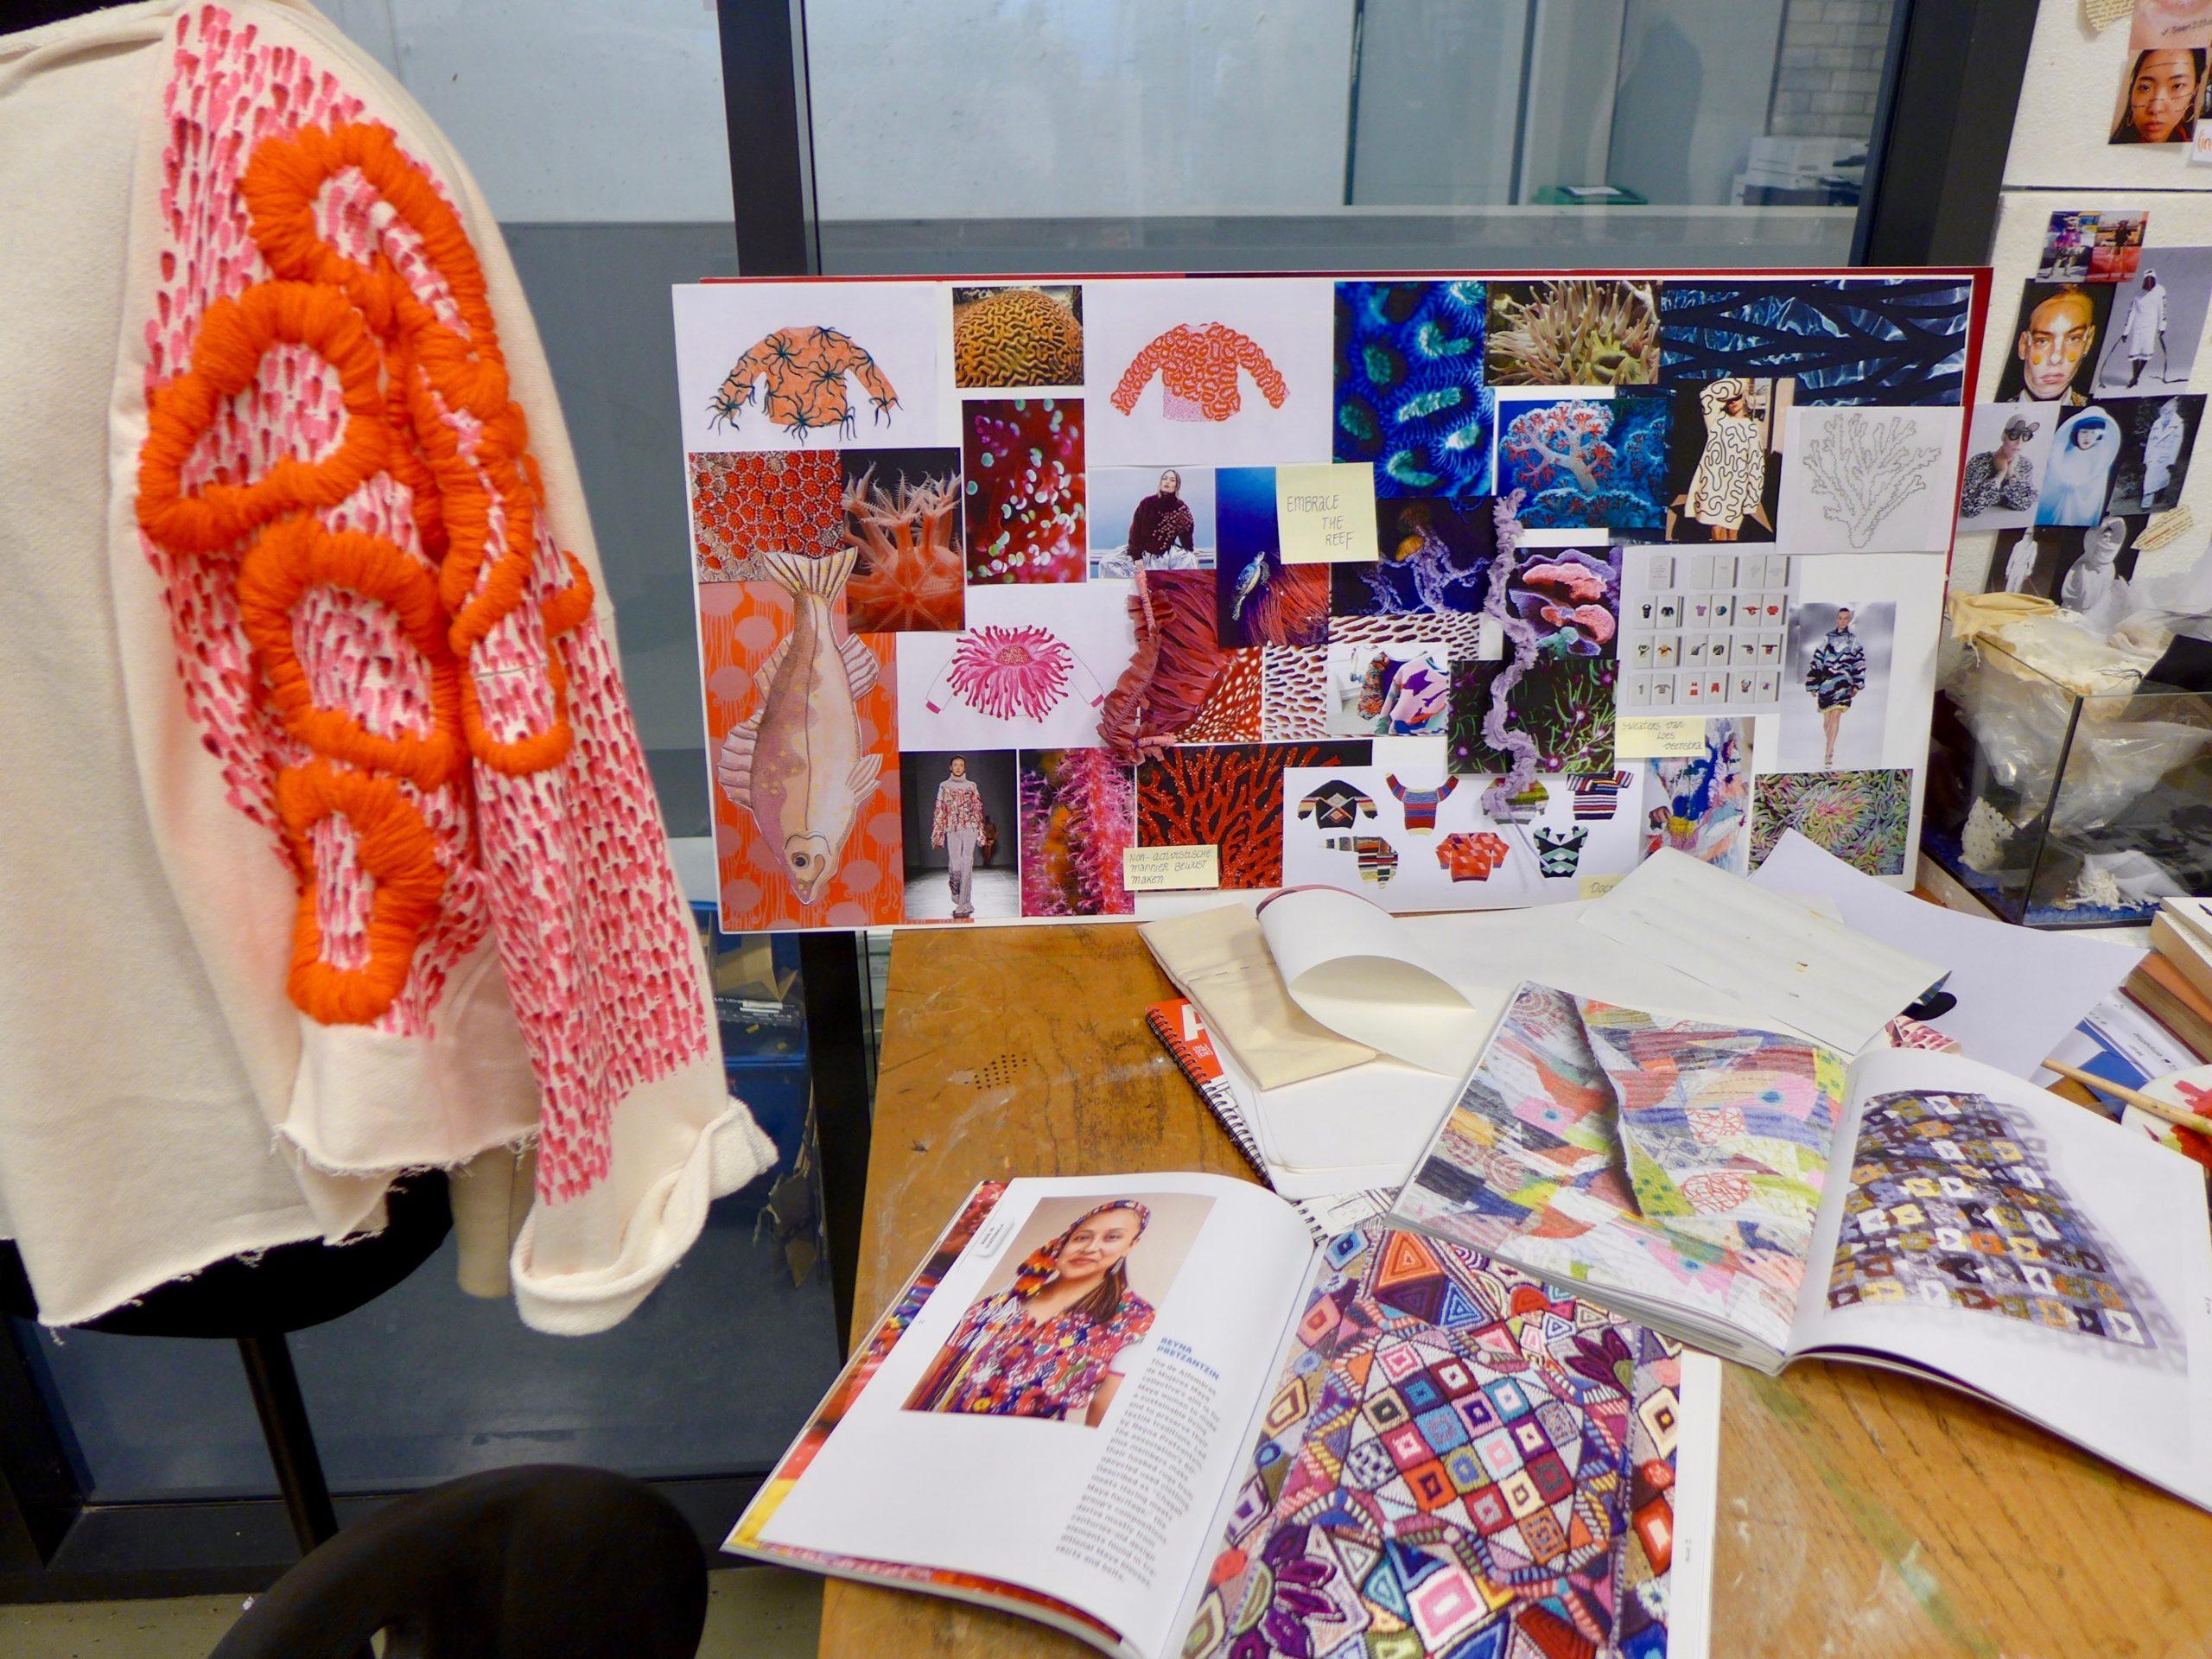 GEANNULEERD / AG academiegalerie / HKU Fashion Design